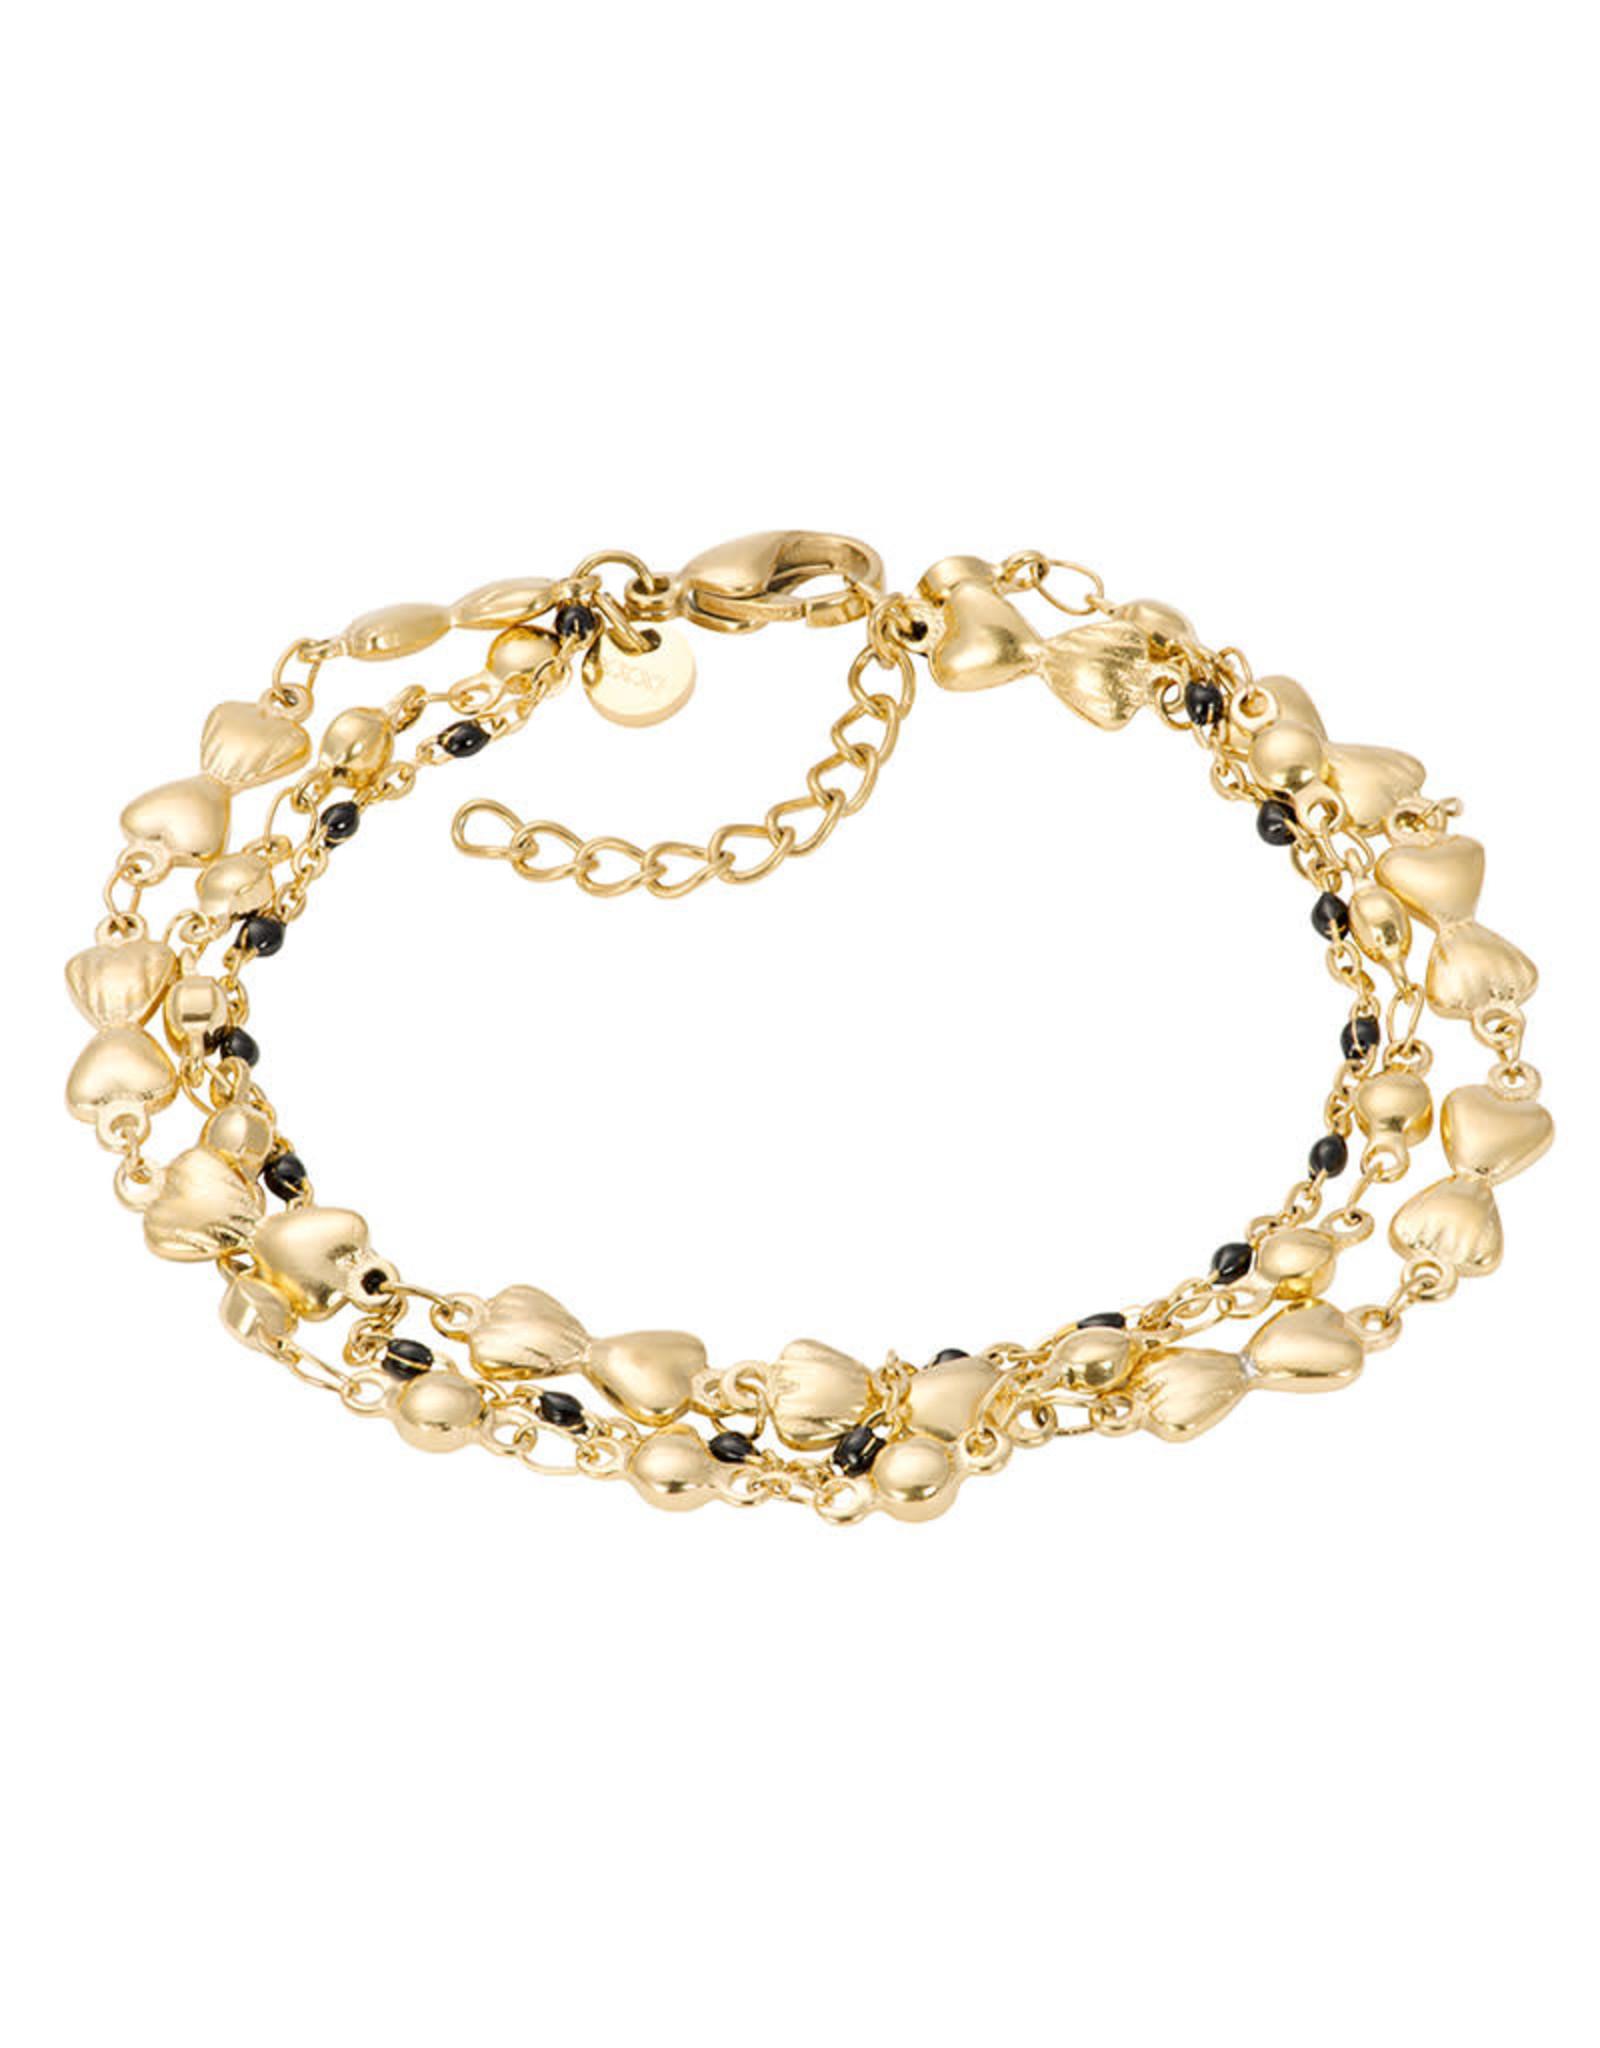 IXXXI IXXXI Bracelets Botswana (black beads) Gold